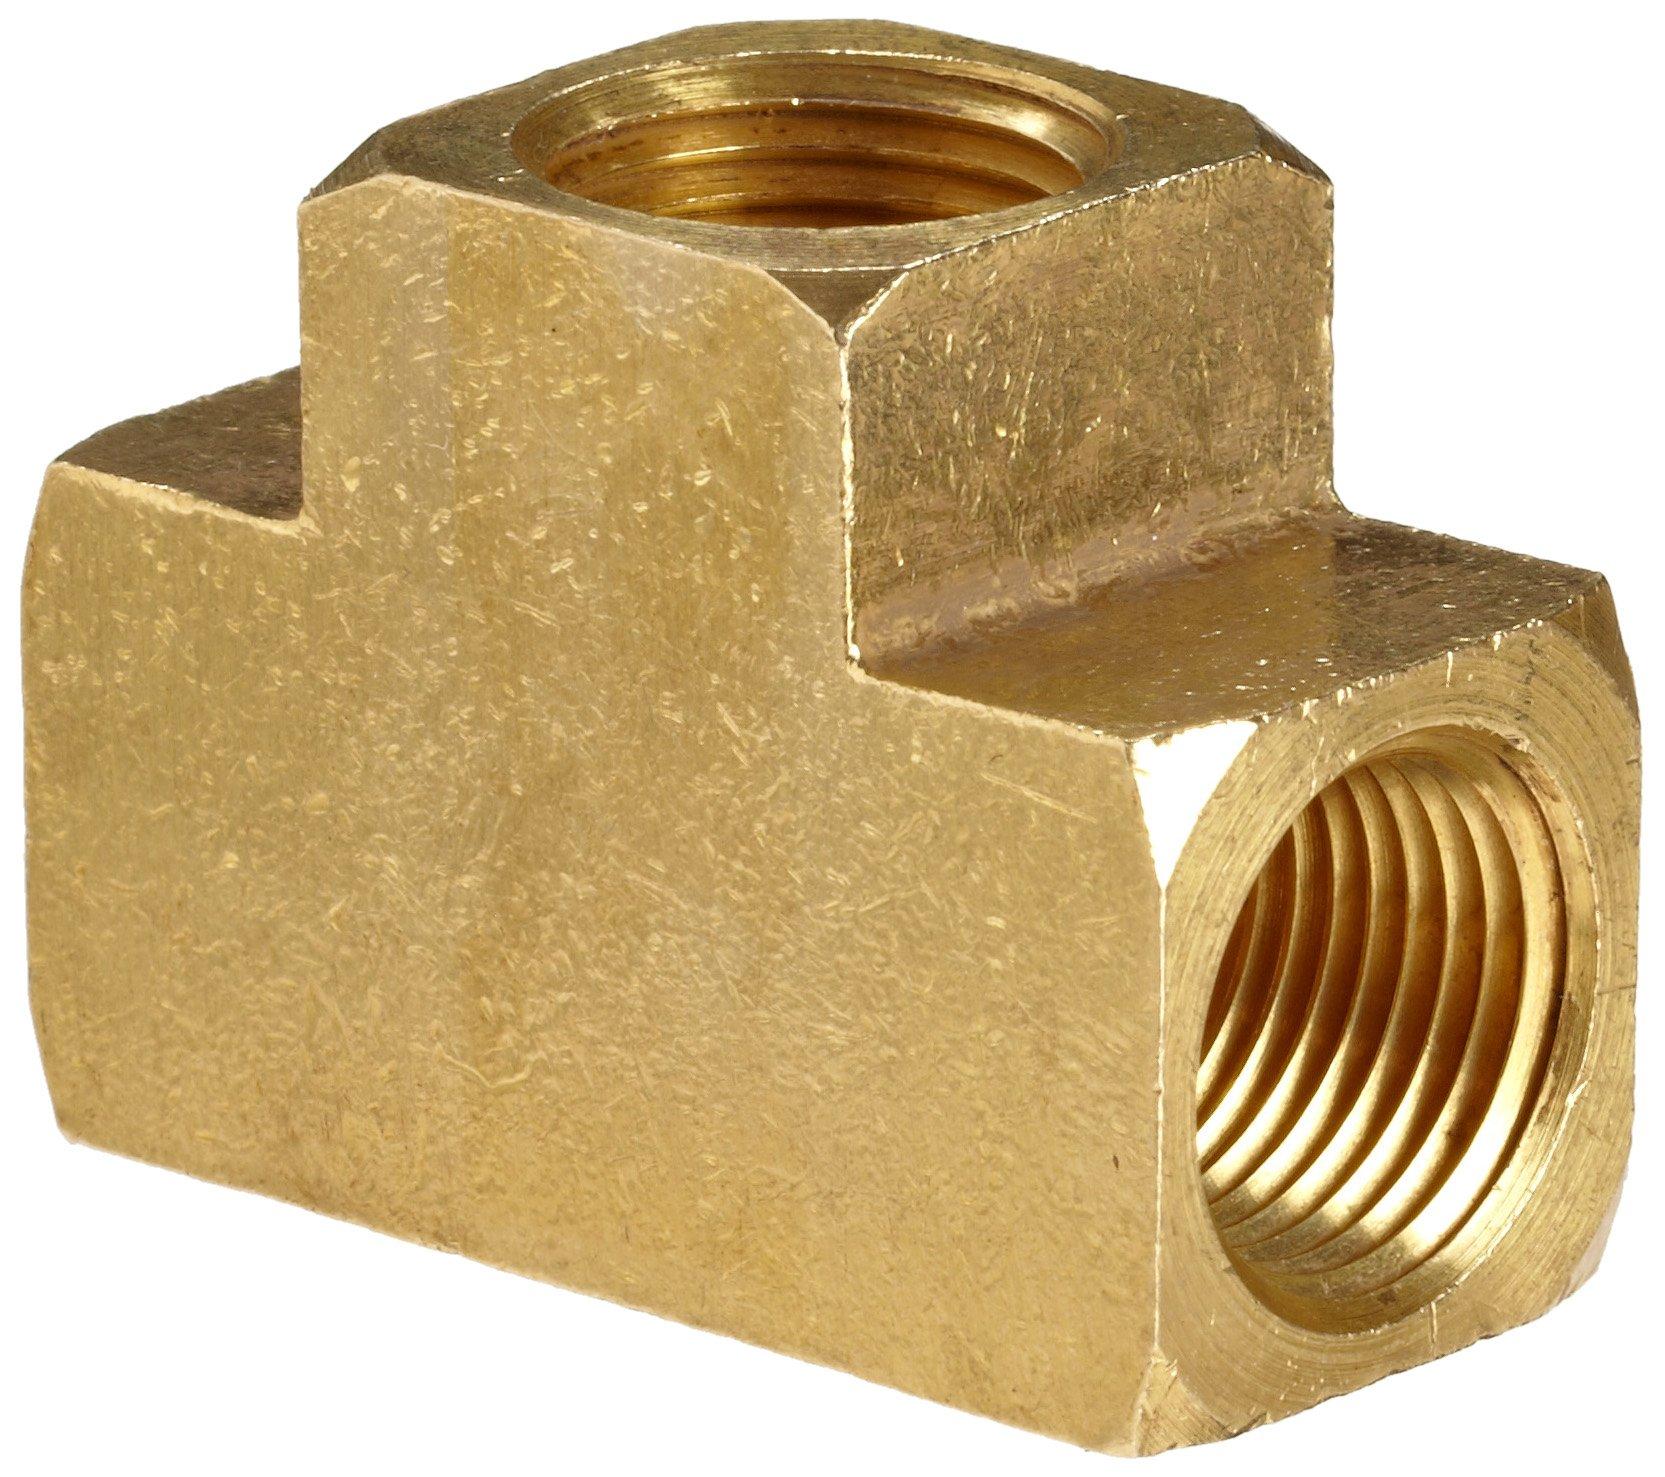 1//8 Female Pipe x 1//8 Male Pipe x 1//8 Female Pipe Anderson Metals Brass Pipe Fitting Barstock Street Tee